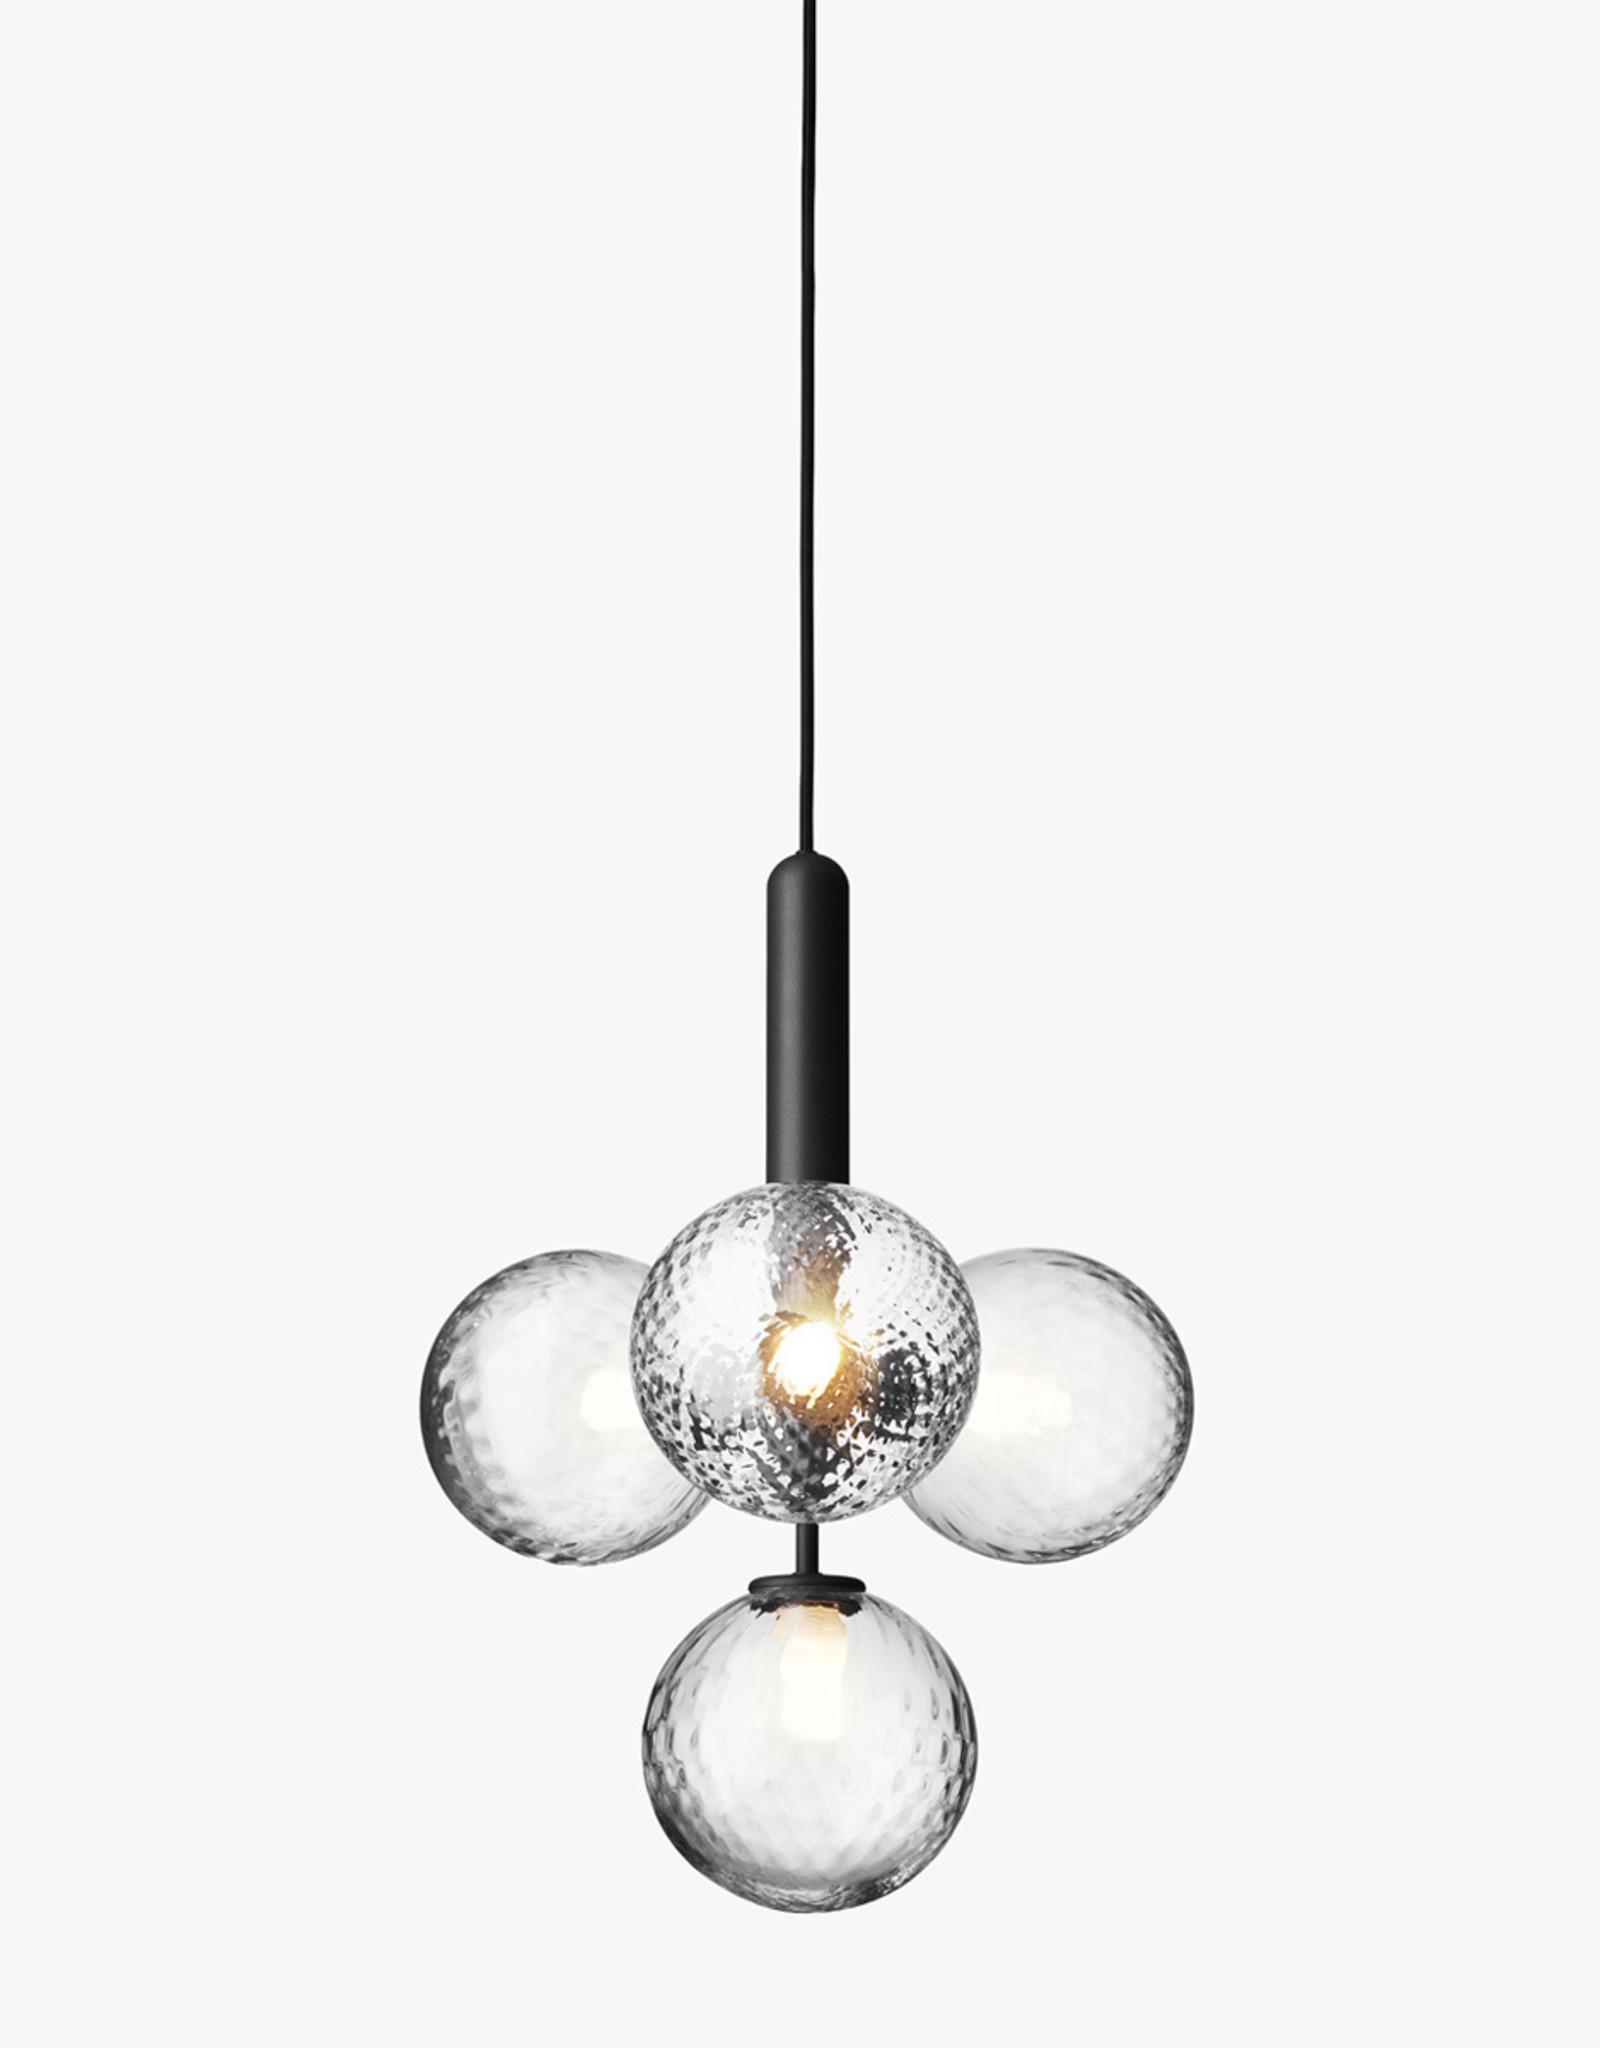 Nuura Miira 4 chandelier by Sofie Refer | Rock grey/optic clear